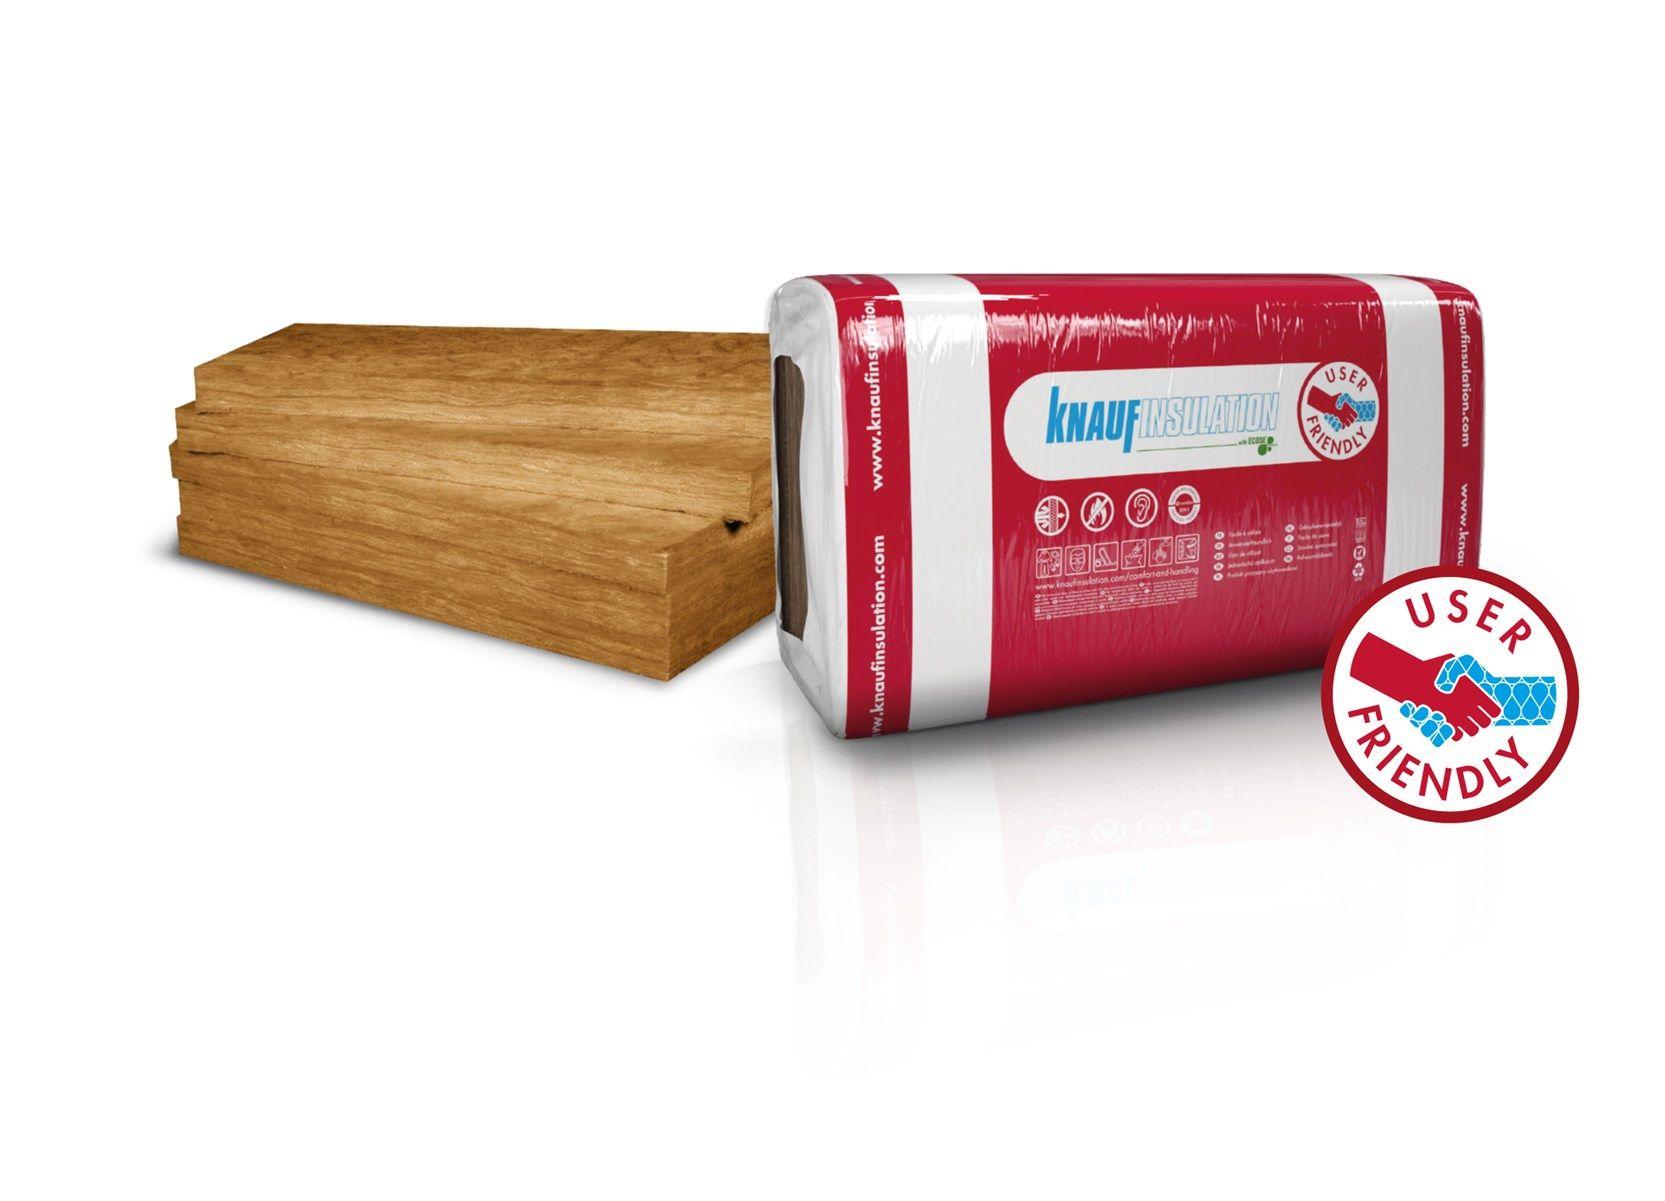 knauf insulation presenta smart wall. Black Bedroom Furniture Sets. Home Design Ideas